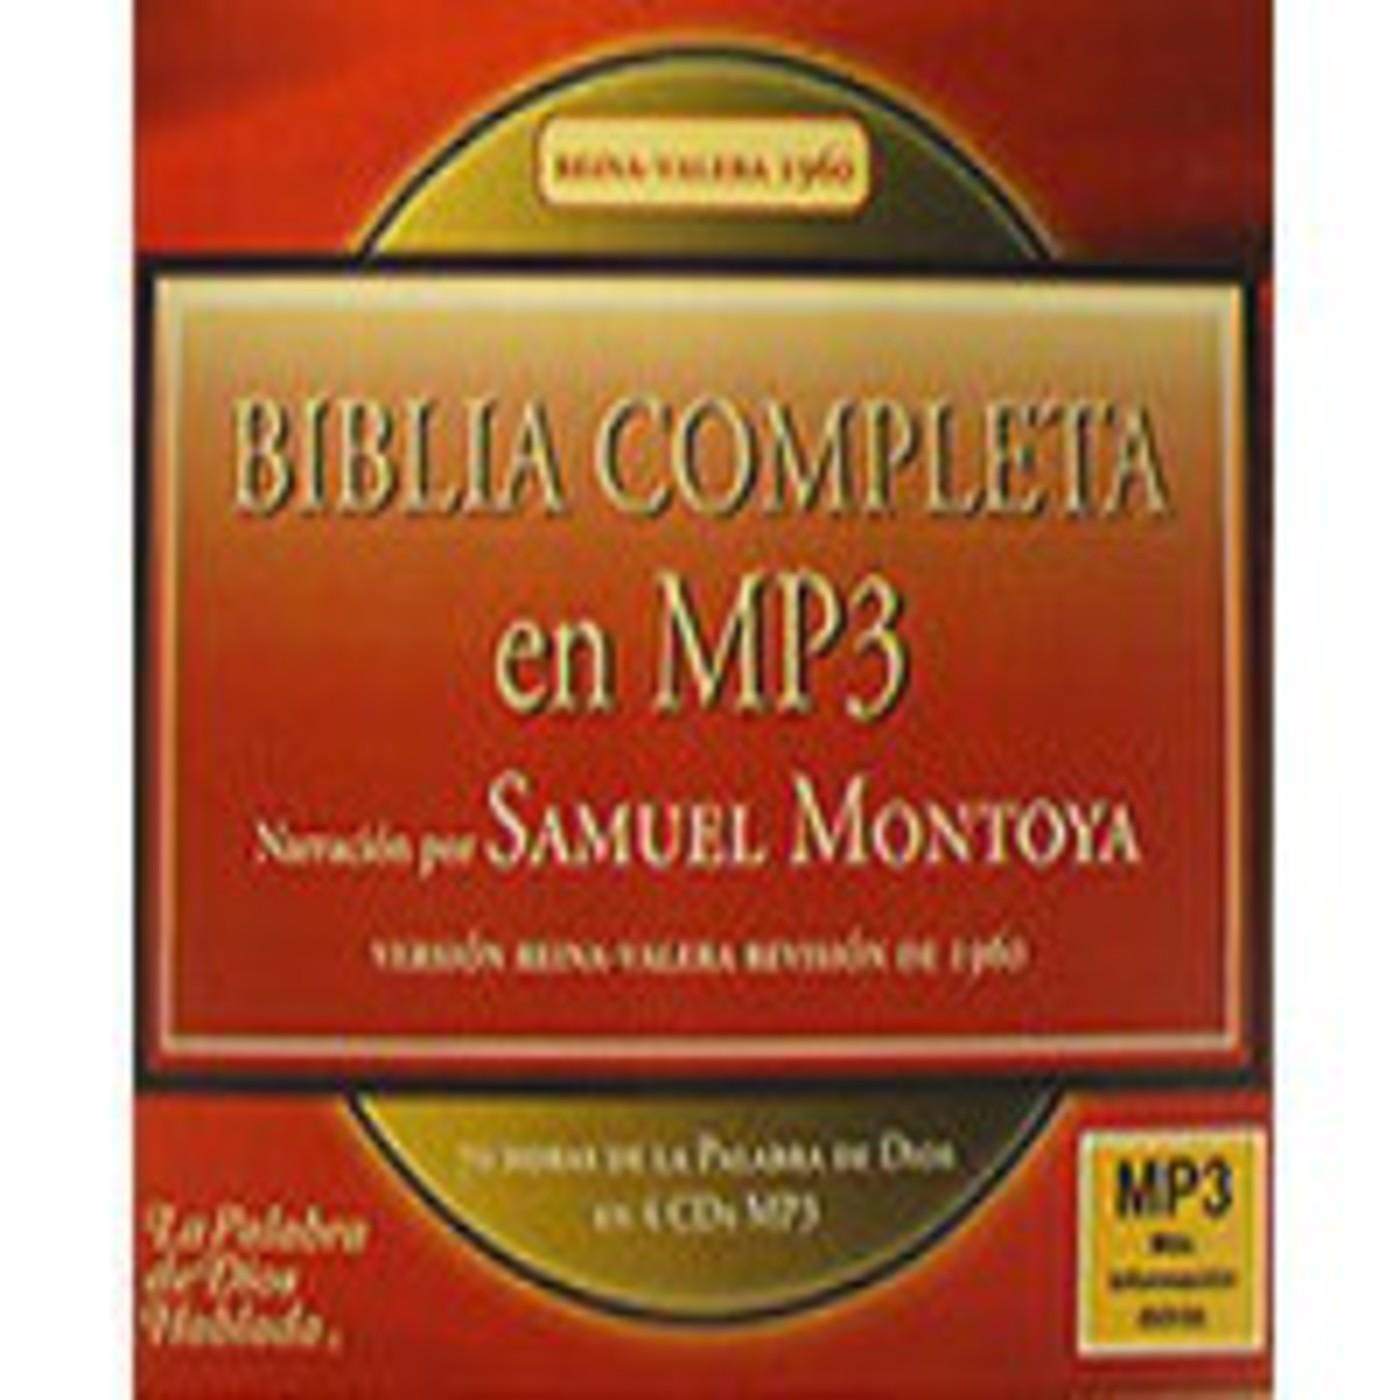 [112/156]BIBLIA en MP3 - Nuevo Testamento - Mateo